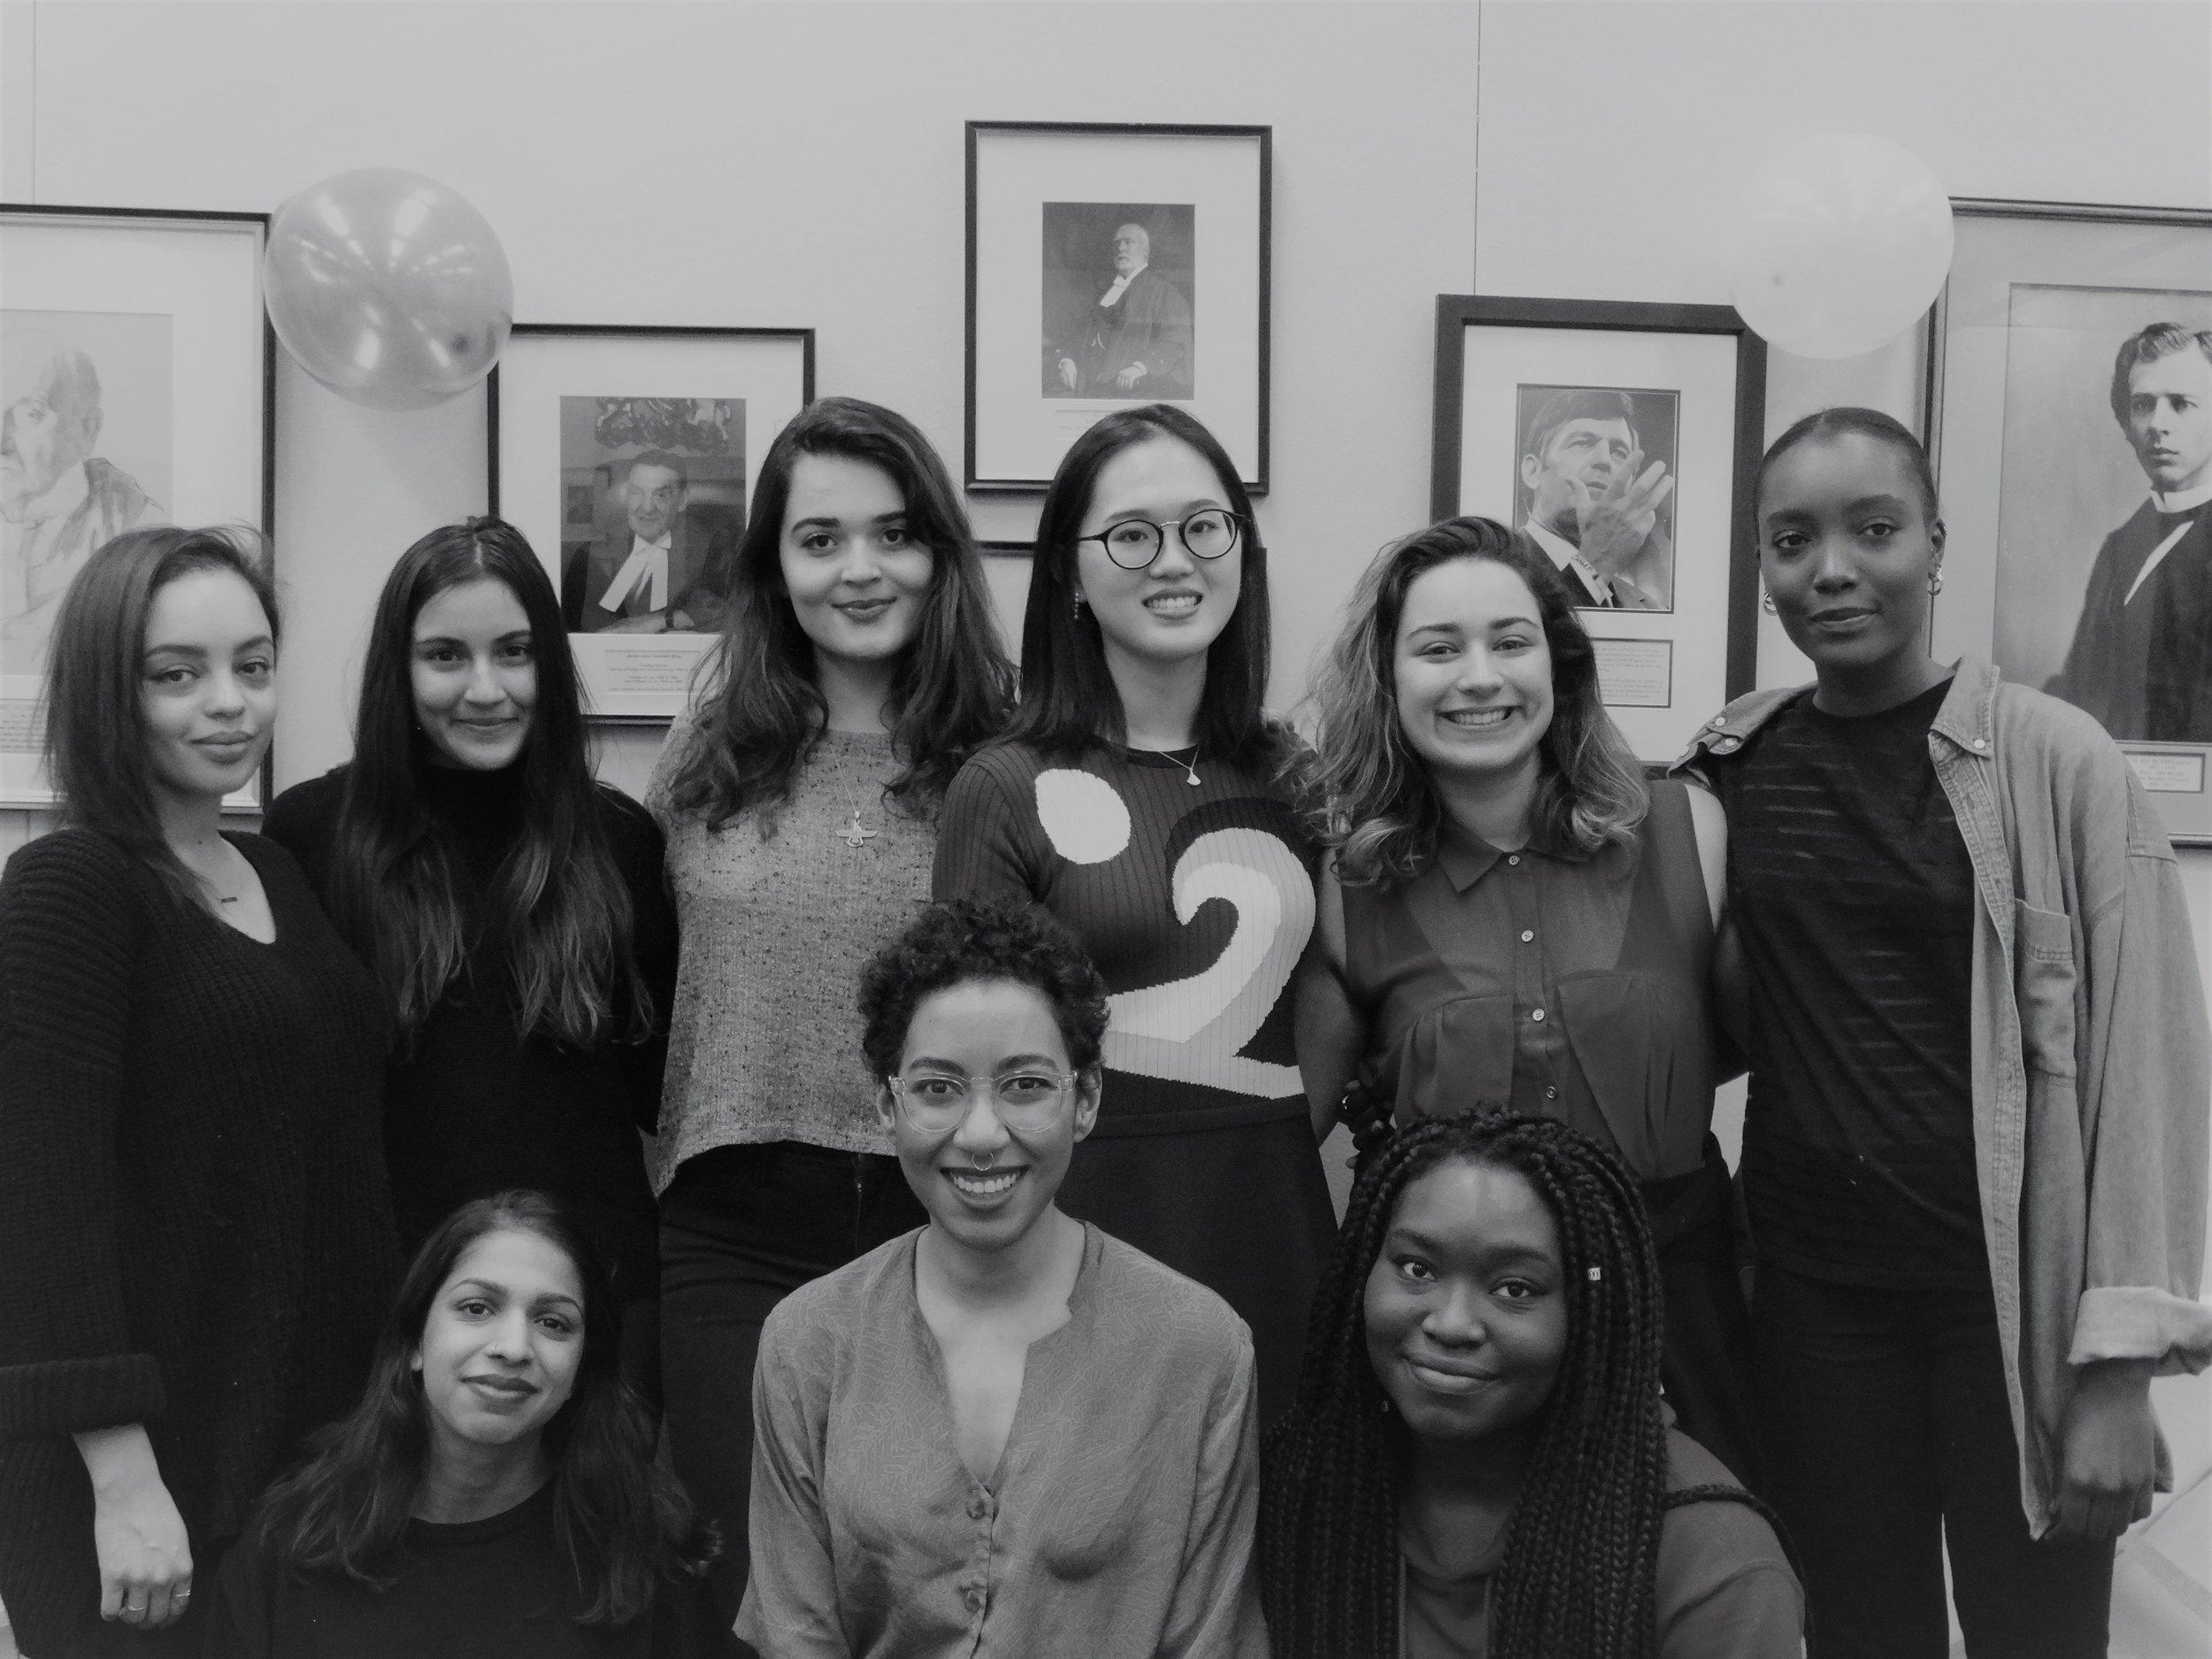 [2017 - 2018]  Back Row from Left to Right: Prudence Etkin, Sabrina Kholam, Dorna Zaboli, Zi Chen Gao, Souhila Baba, Mariam Sarr  Front Row from Left to Right: Natasha Goel, Marilou Craft, Rachelle Rose